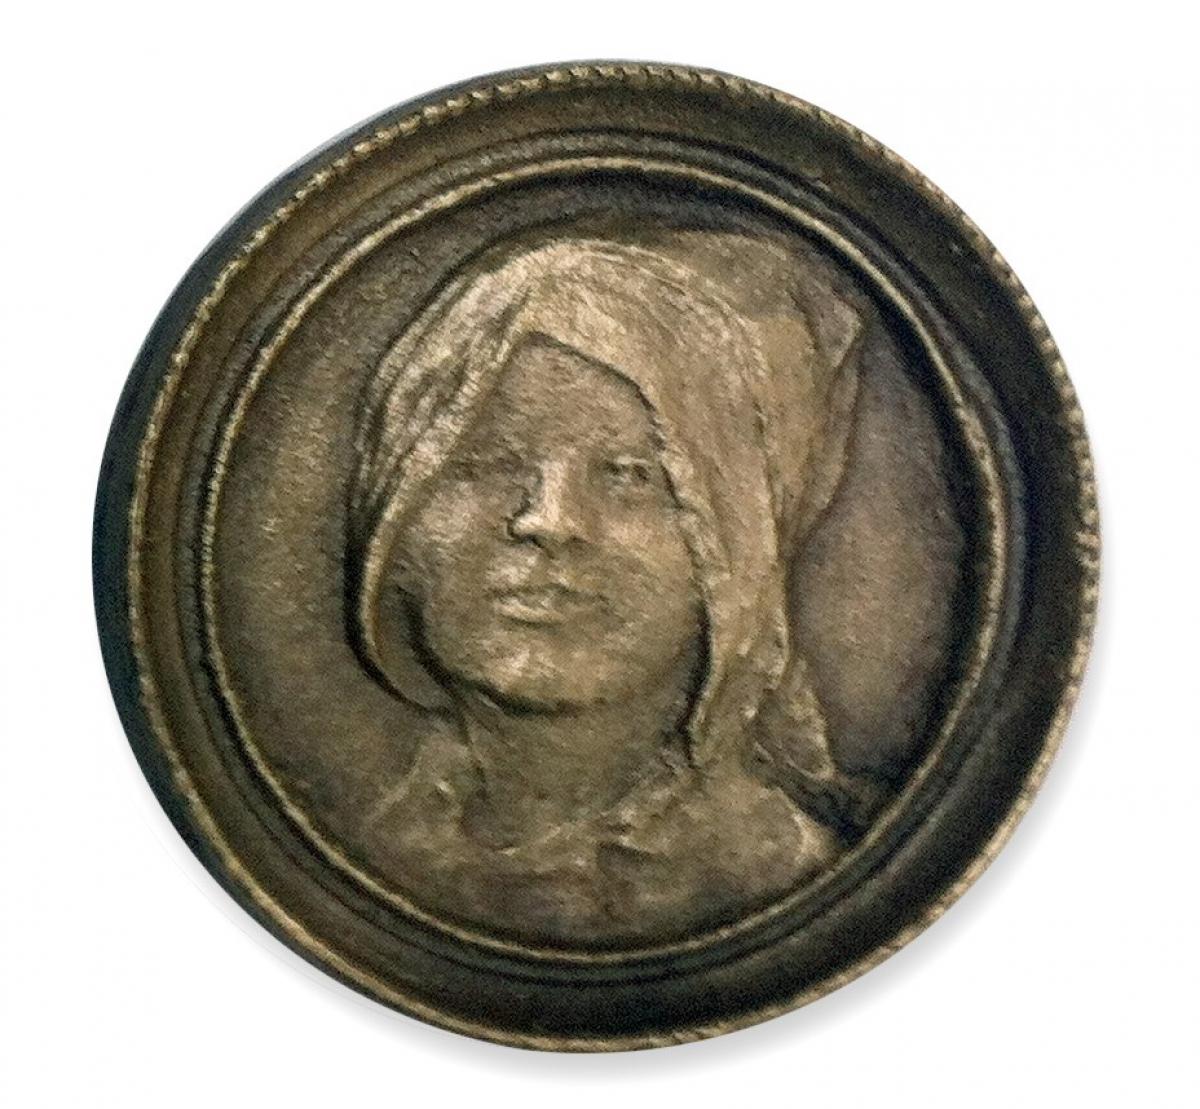 Uśmiechnięta Sylwia, OPUS 1725, brąz, Φ 7 cm, 2001